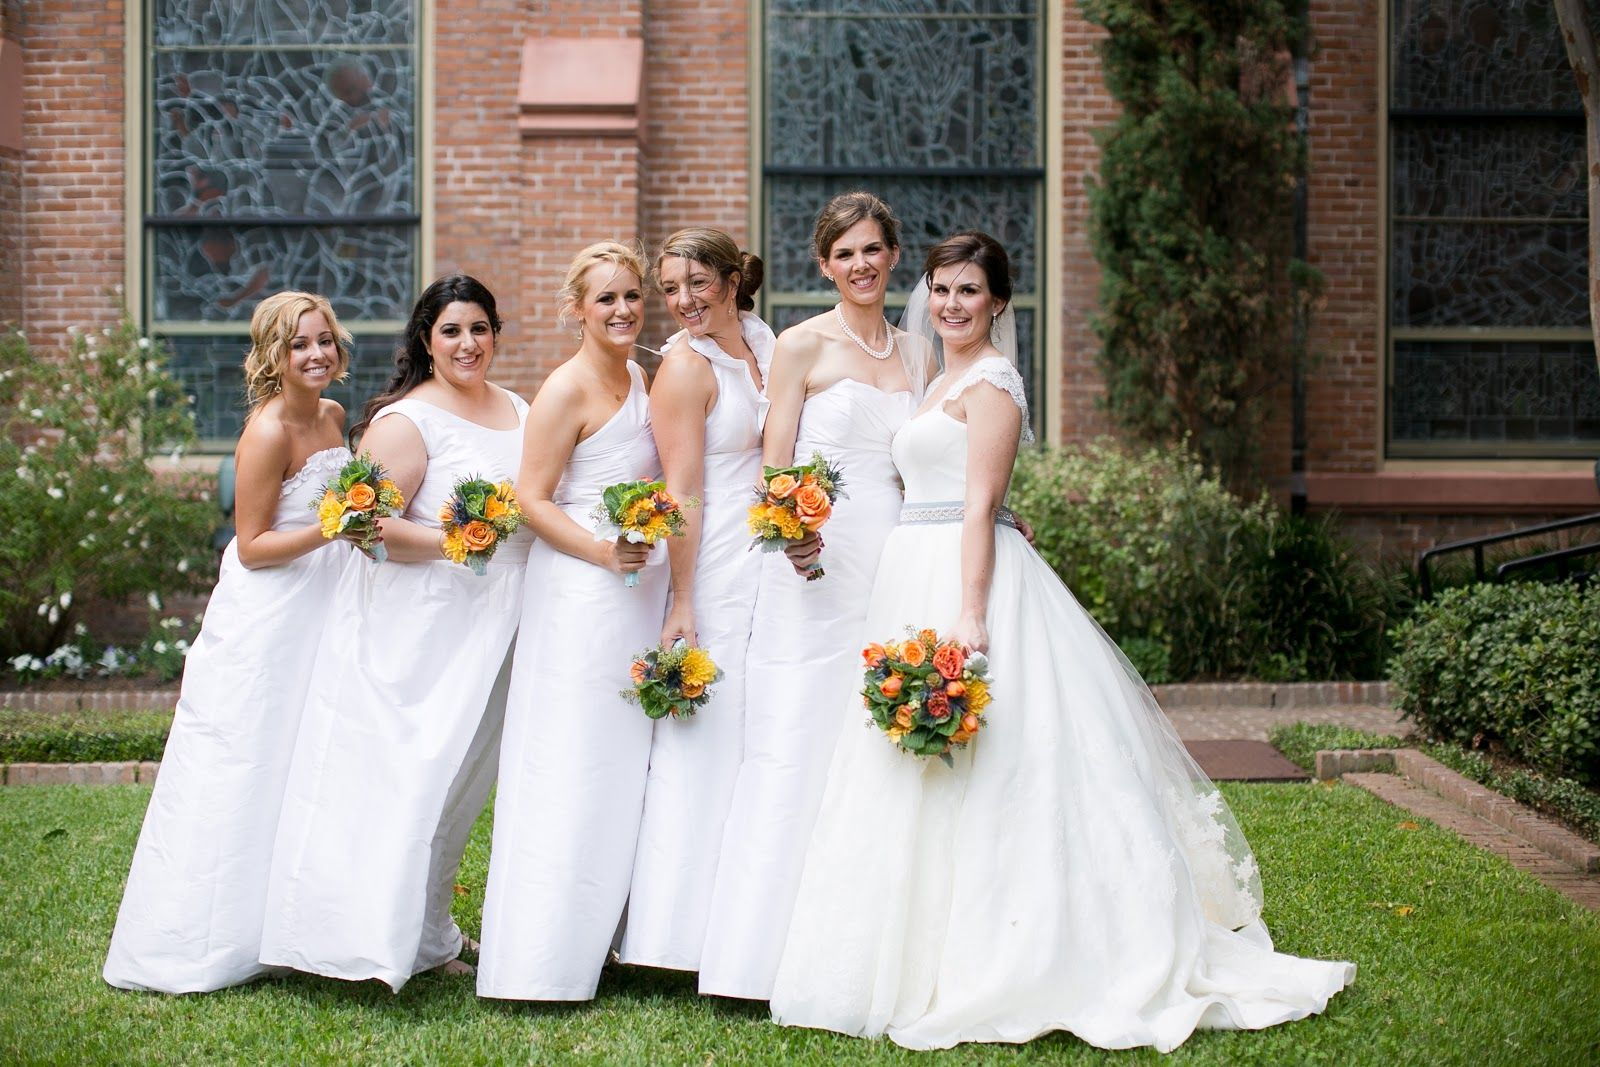 White bridesmaid dresses dressed up girl bridesmaid dresses white bridesmaid dresses dressed up girl ombrellifo Choice Image